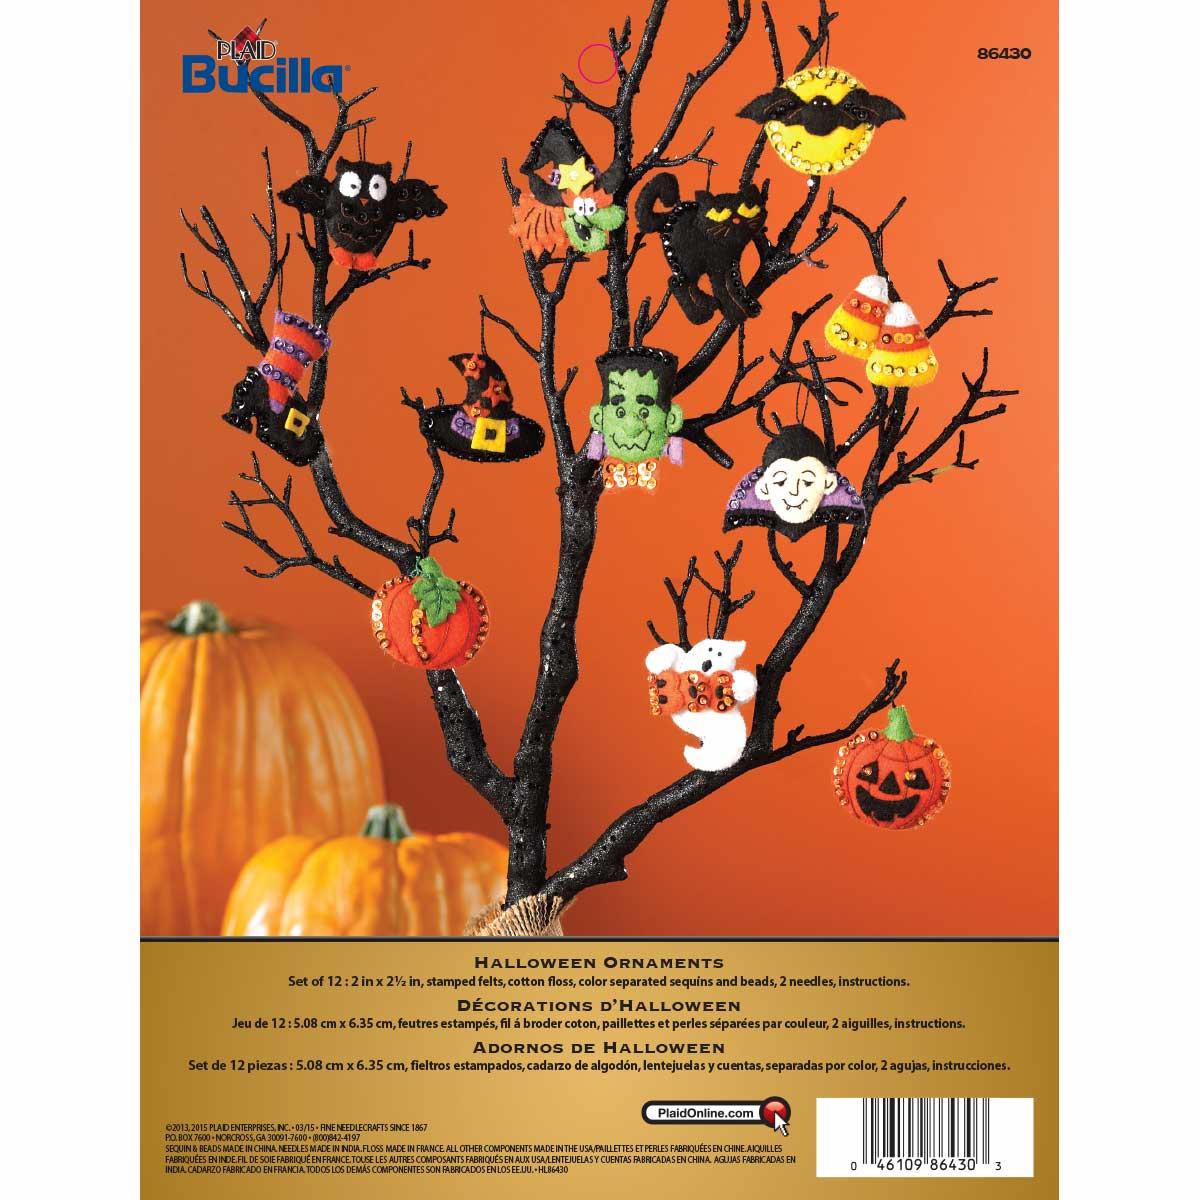 Bucilla ® Seasonal - Felt - Ornament Kits - Halloween - 86430